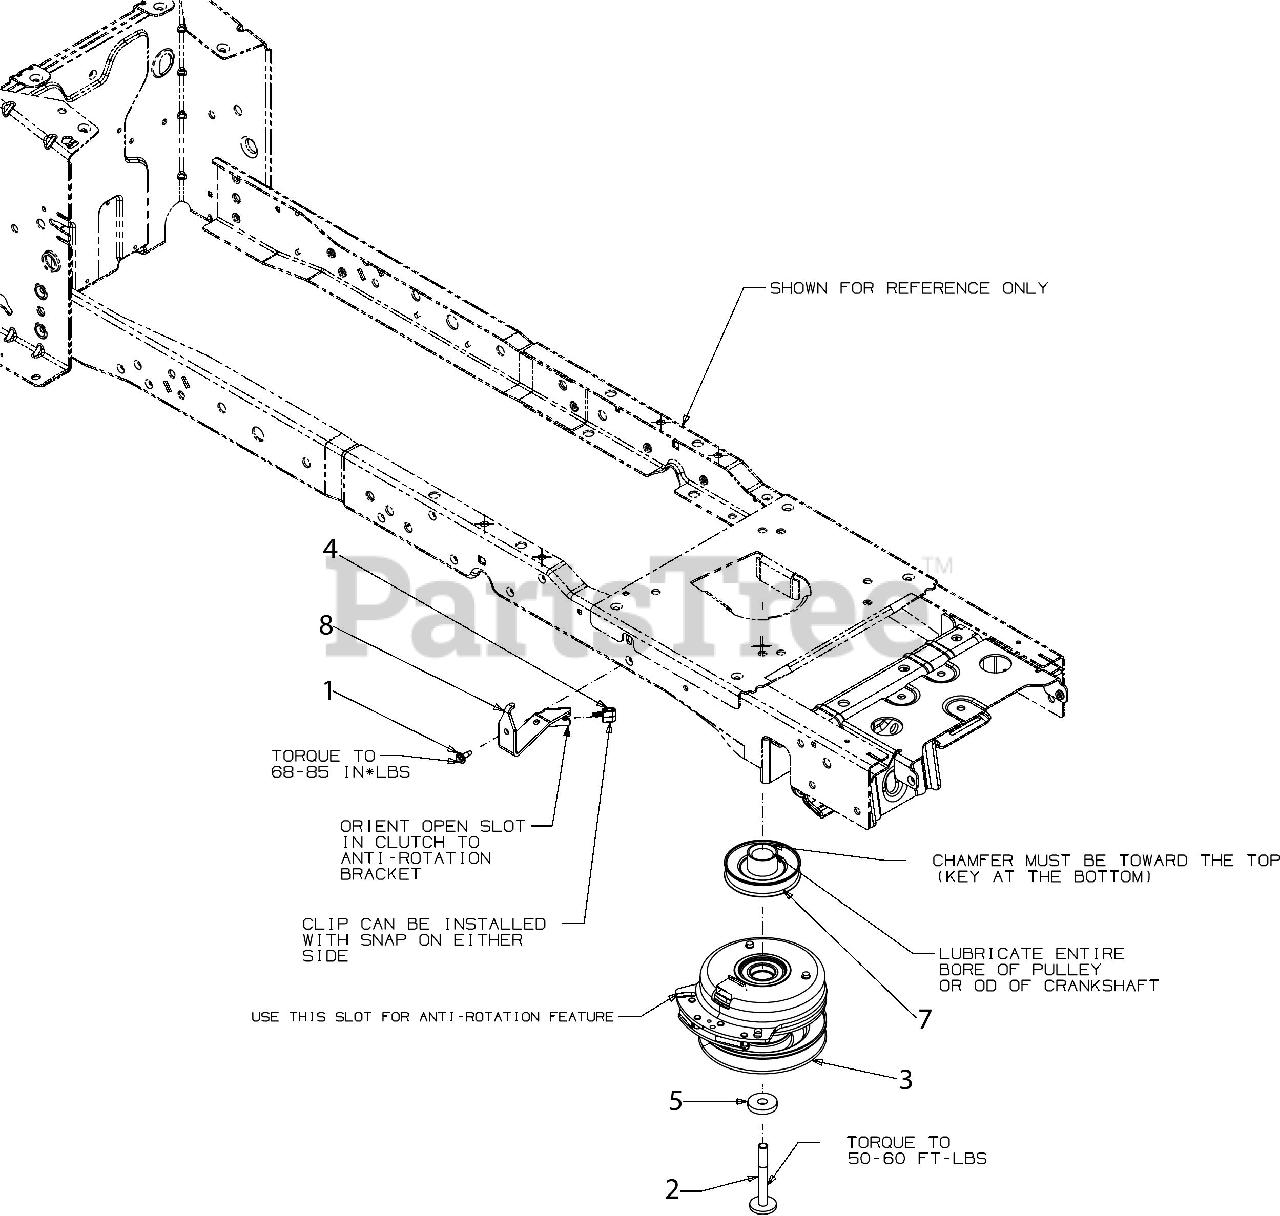 Craftsman 247 13aaa1zw099